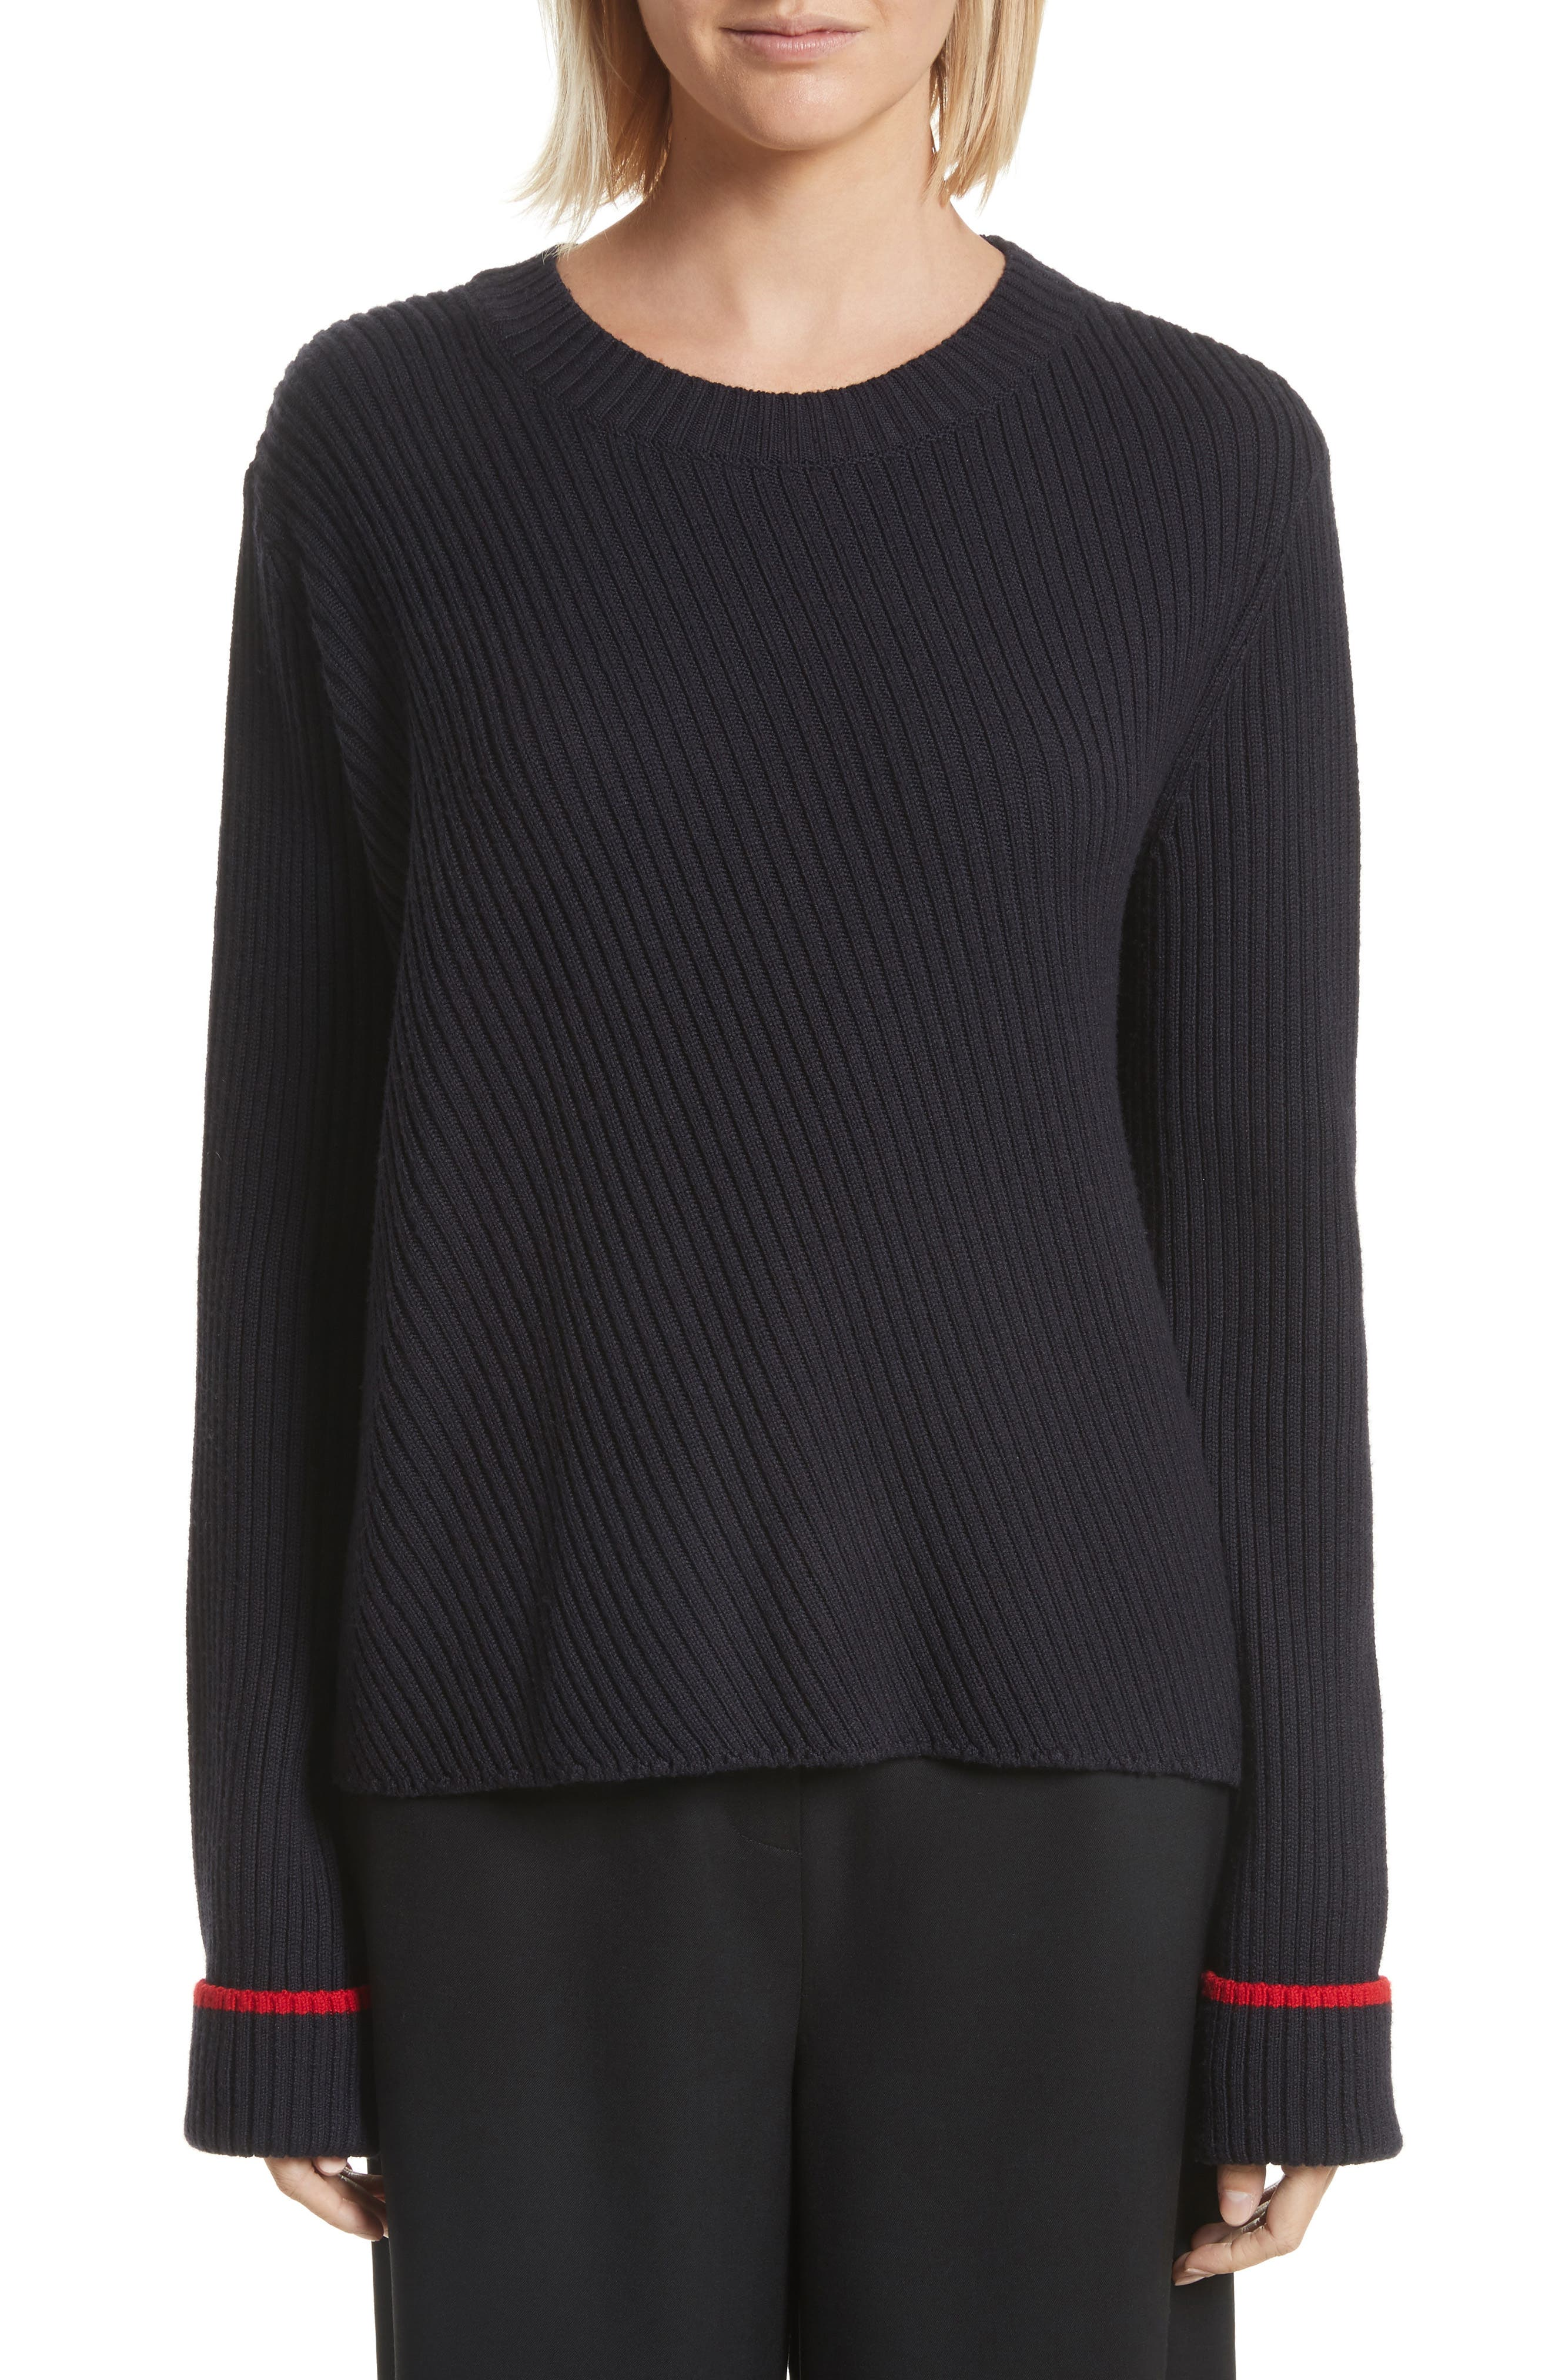 GREY Jason Wu Contrast Trim Merino Wool Sweater